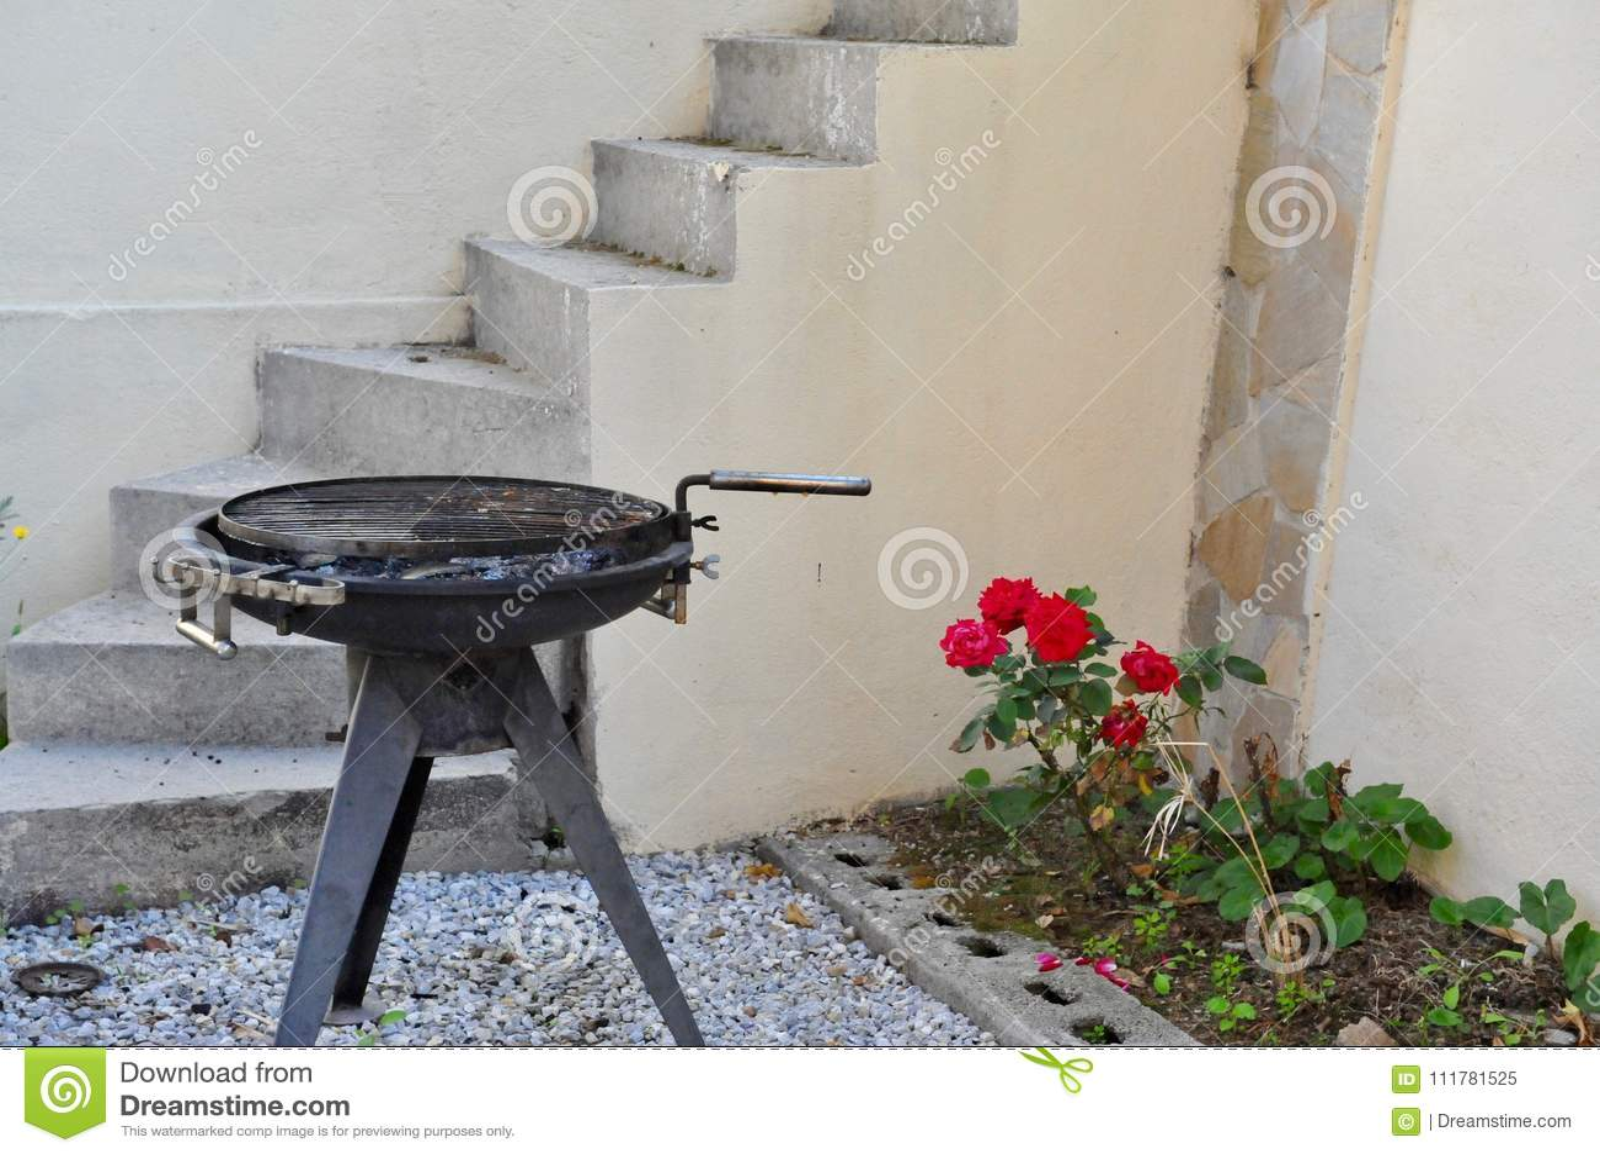 Barbecue on backyard